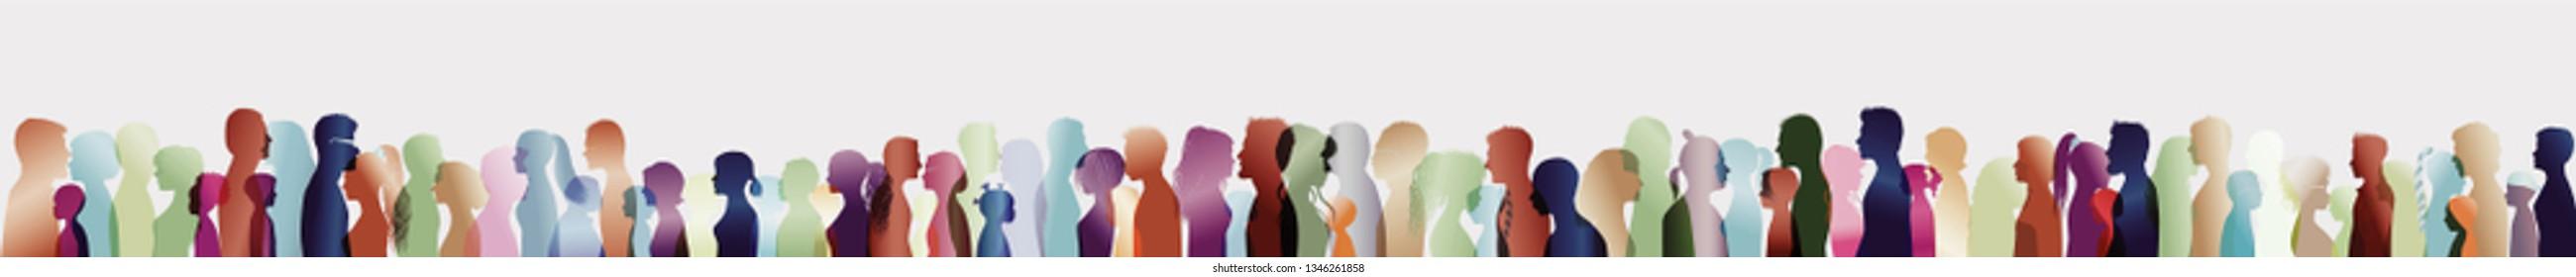 Talking crowd. Large group of people. Dialogue between people. Silhouette profiles. People talking. Blue multiple exposure